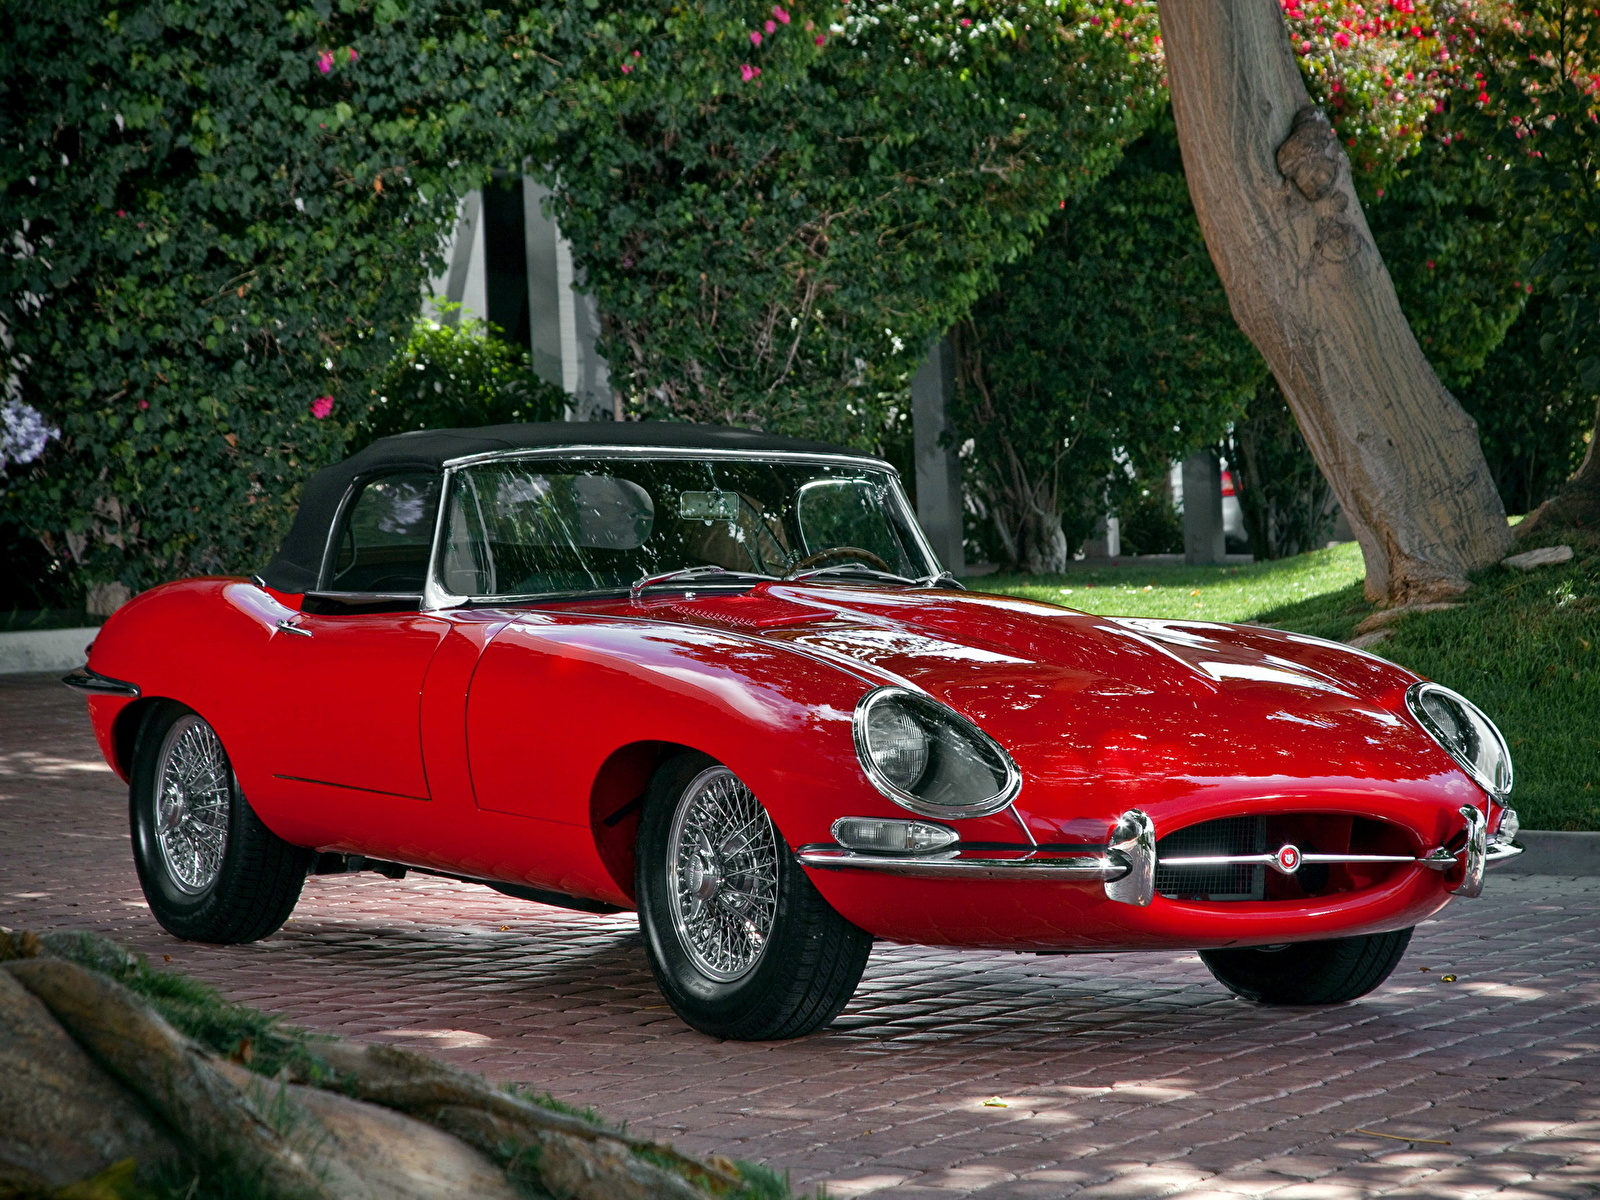 Картинки Ягуар E Type Roadster (Series I)  1961–67 Родстер Автомобили 1600x1200 Jaguar авто машина машины автомобиль